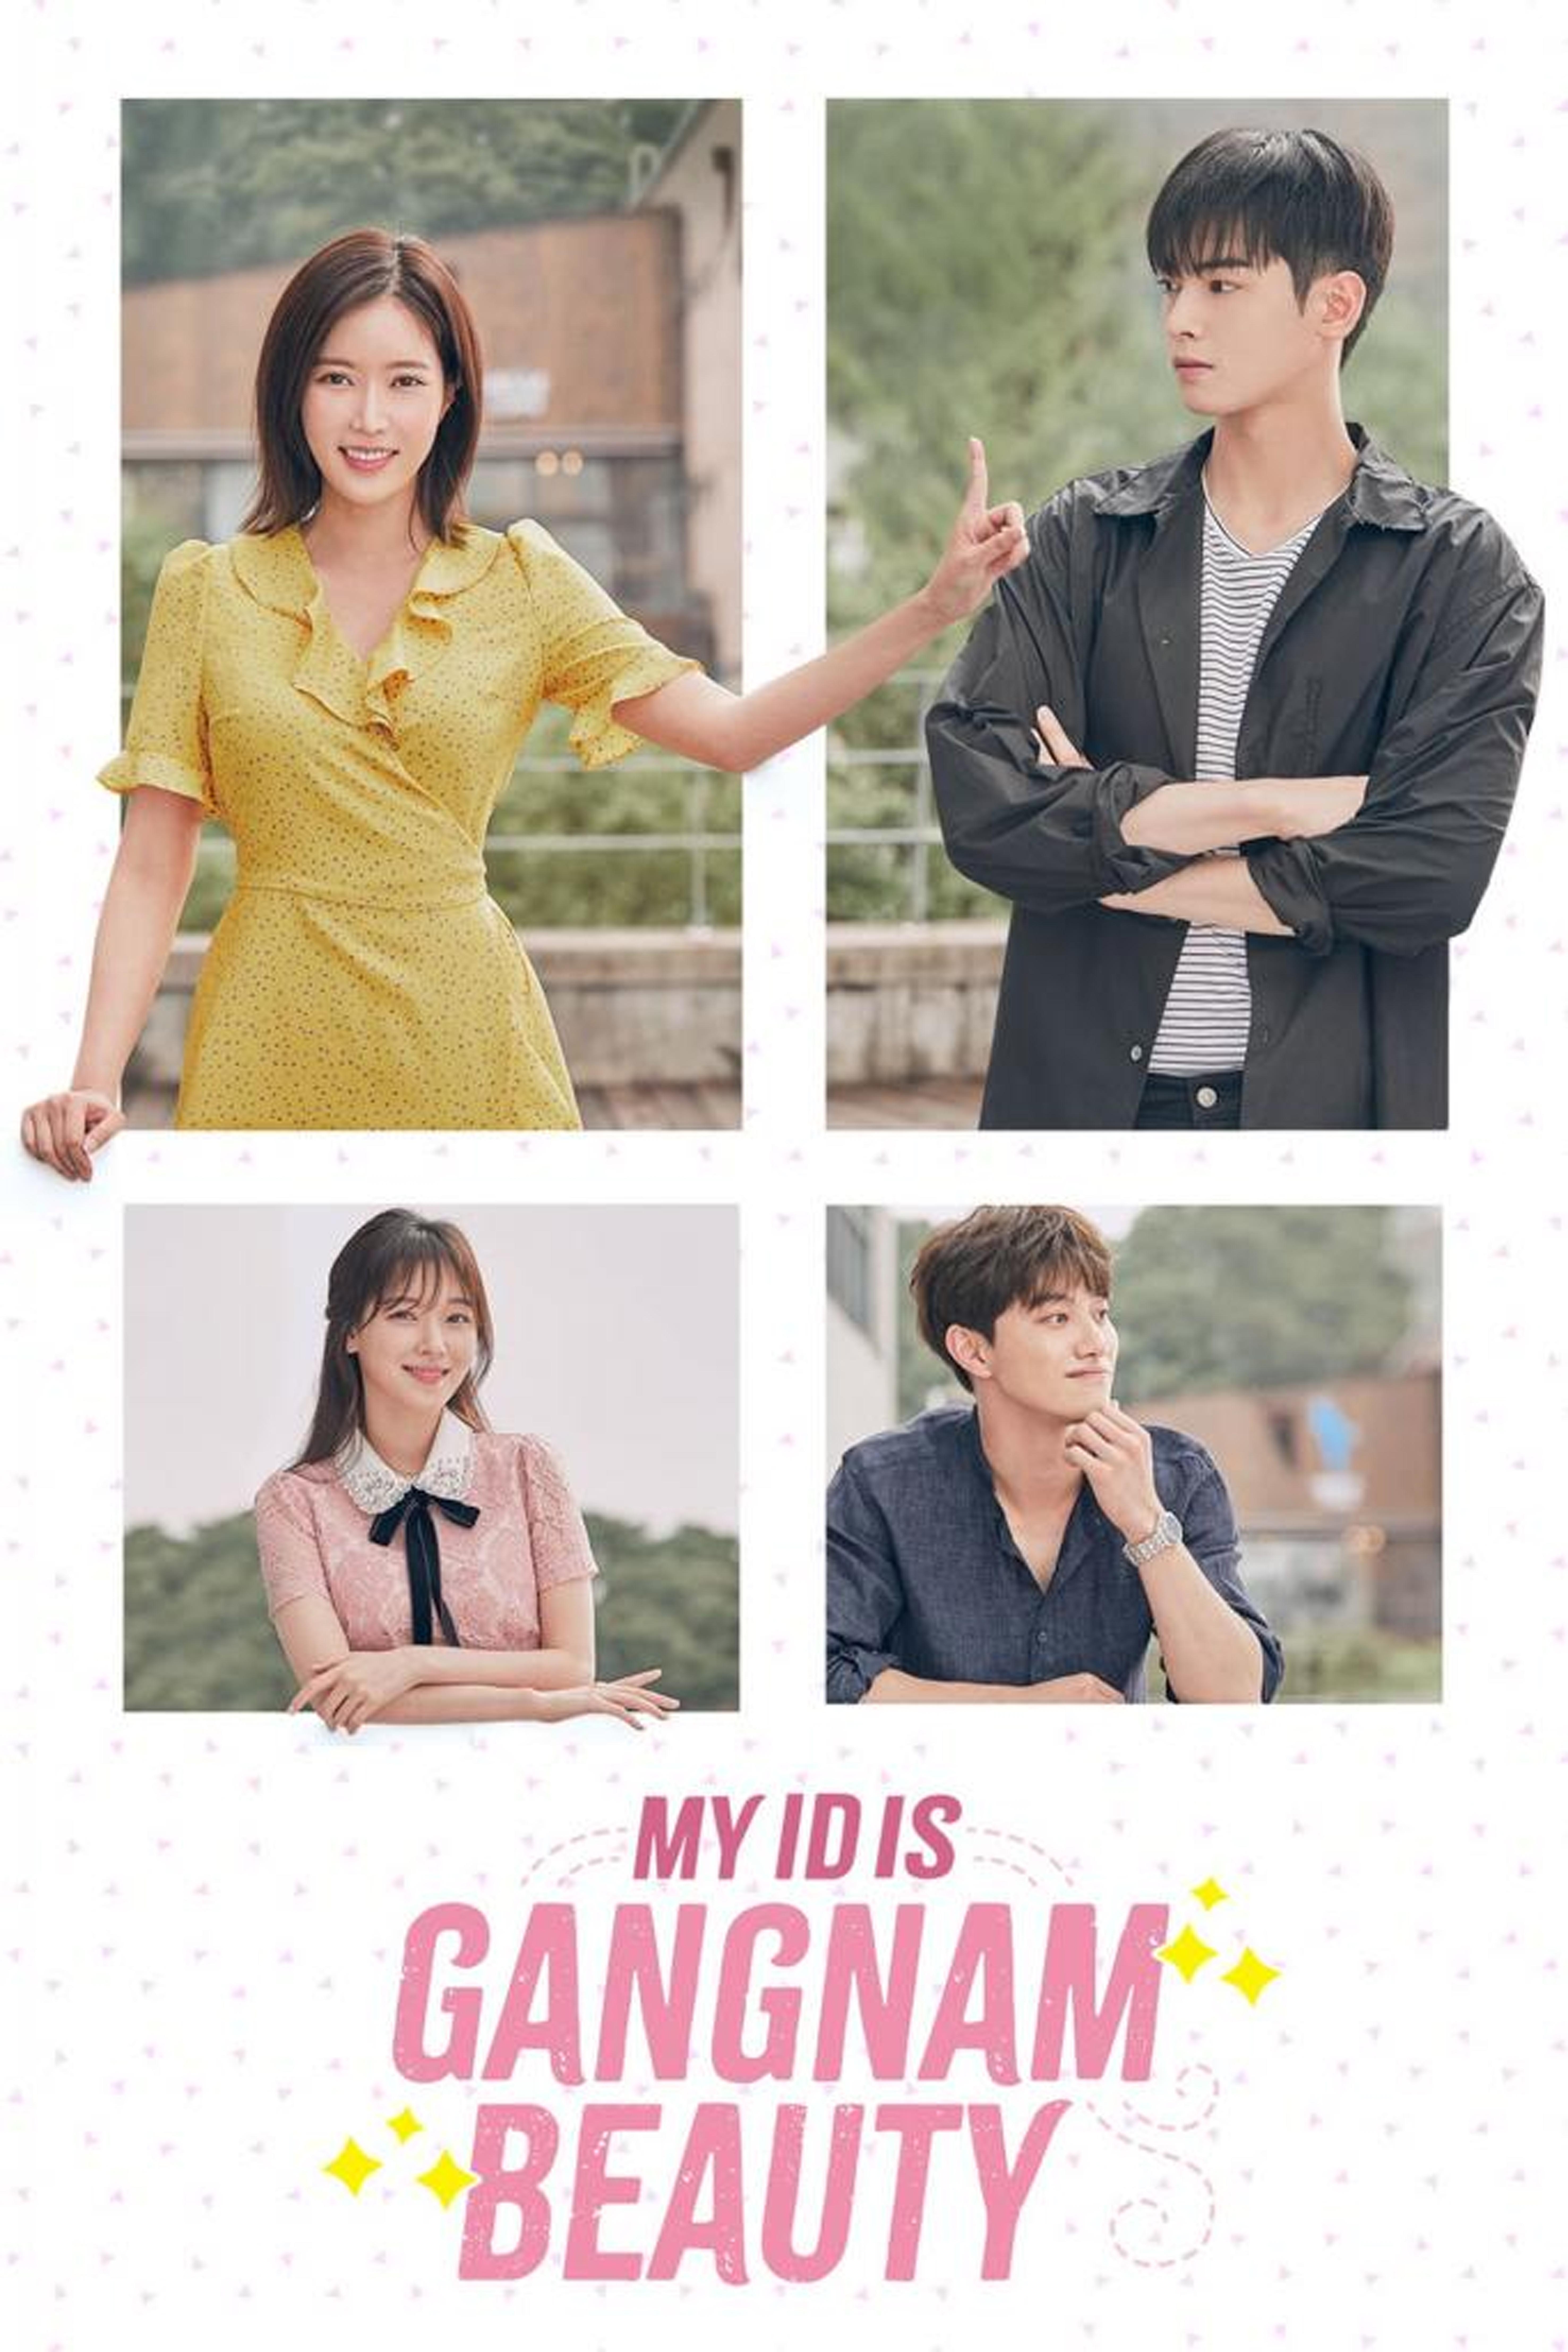 My ID Is Gangnam Beauty (Cantonese) - 我的ID是江南美人